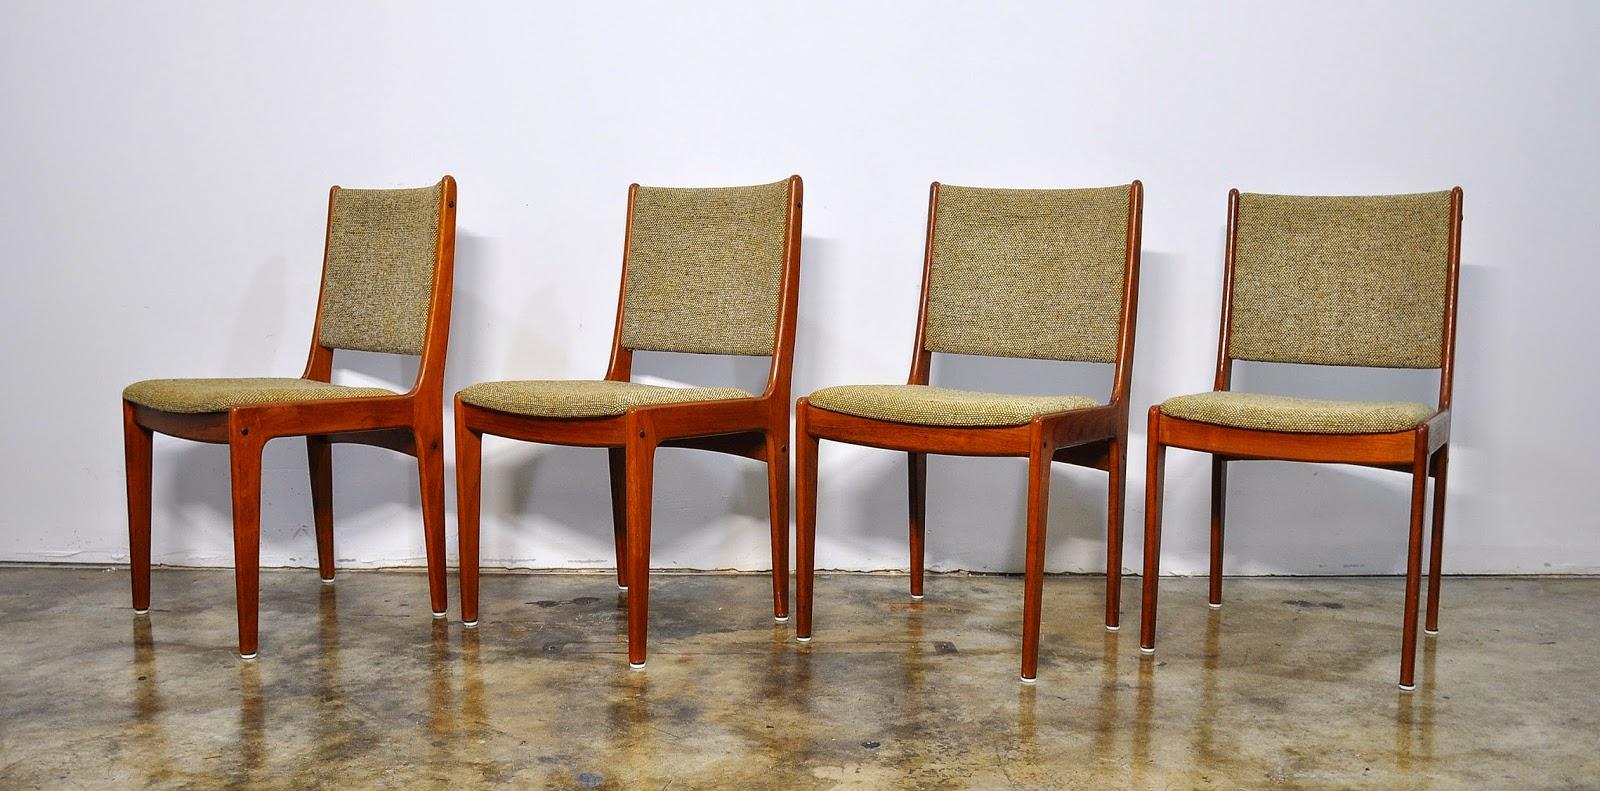 danish modern dining chairs adirondack fire pit select modern: set of 4 teak